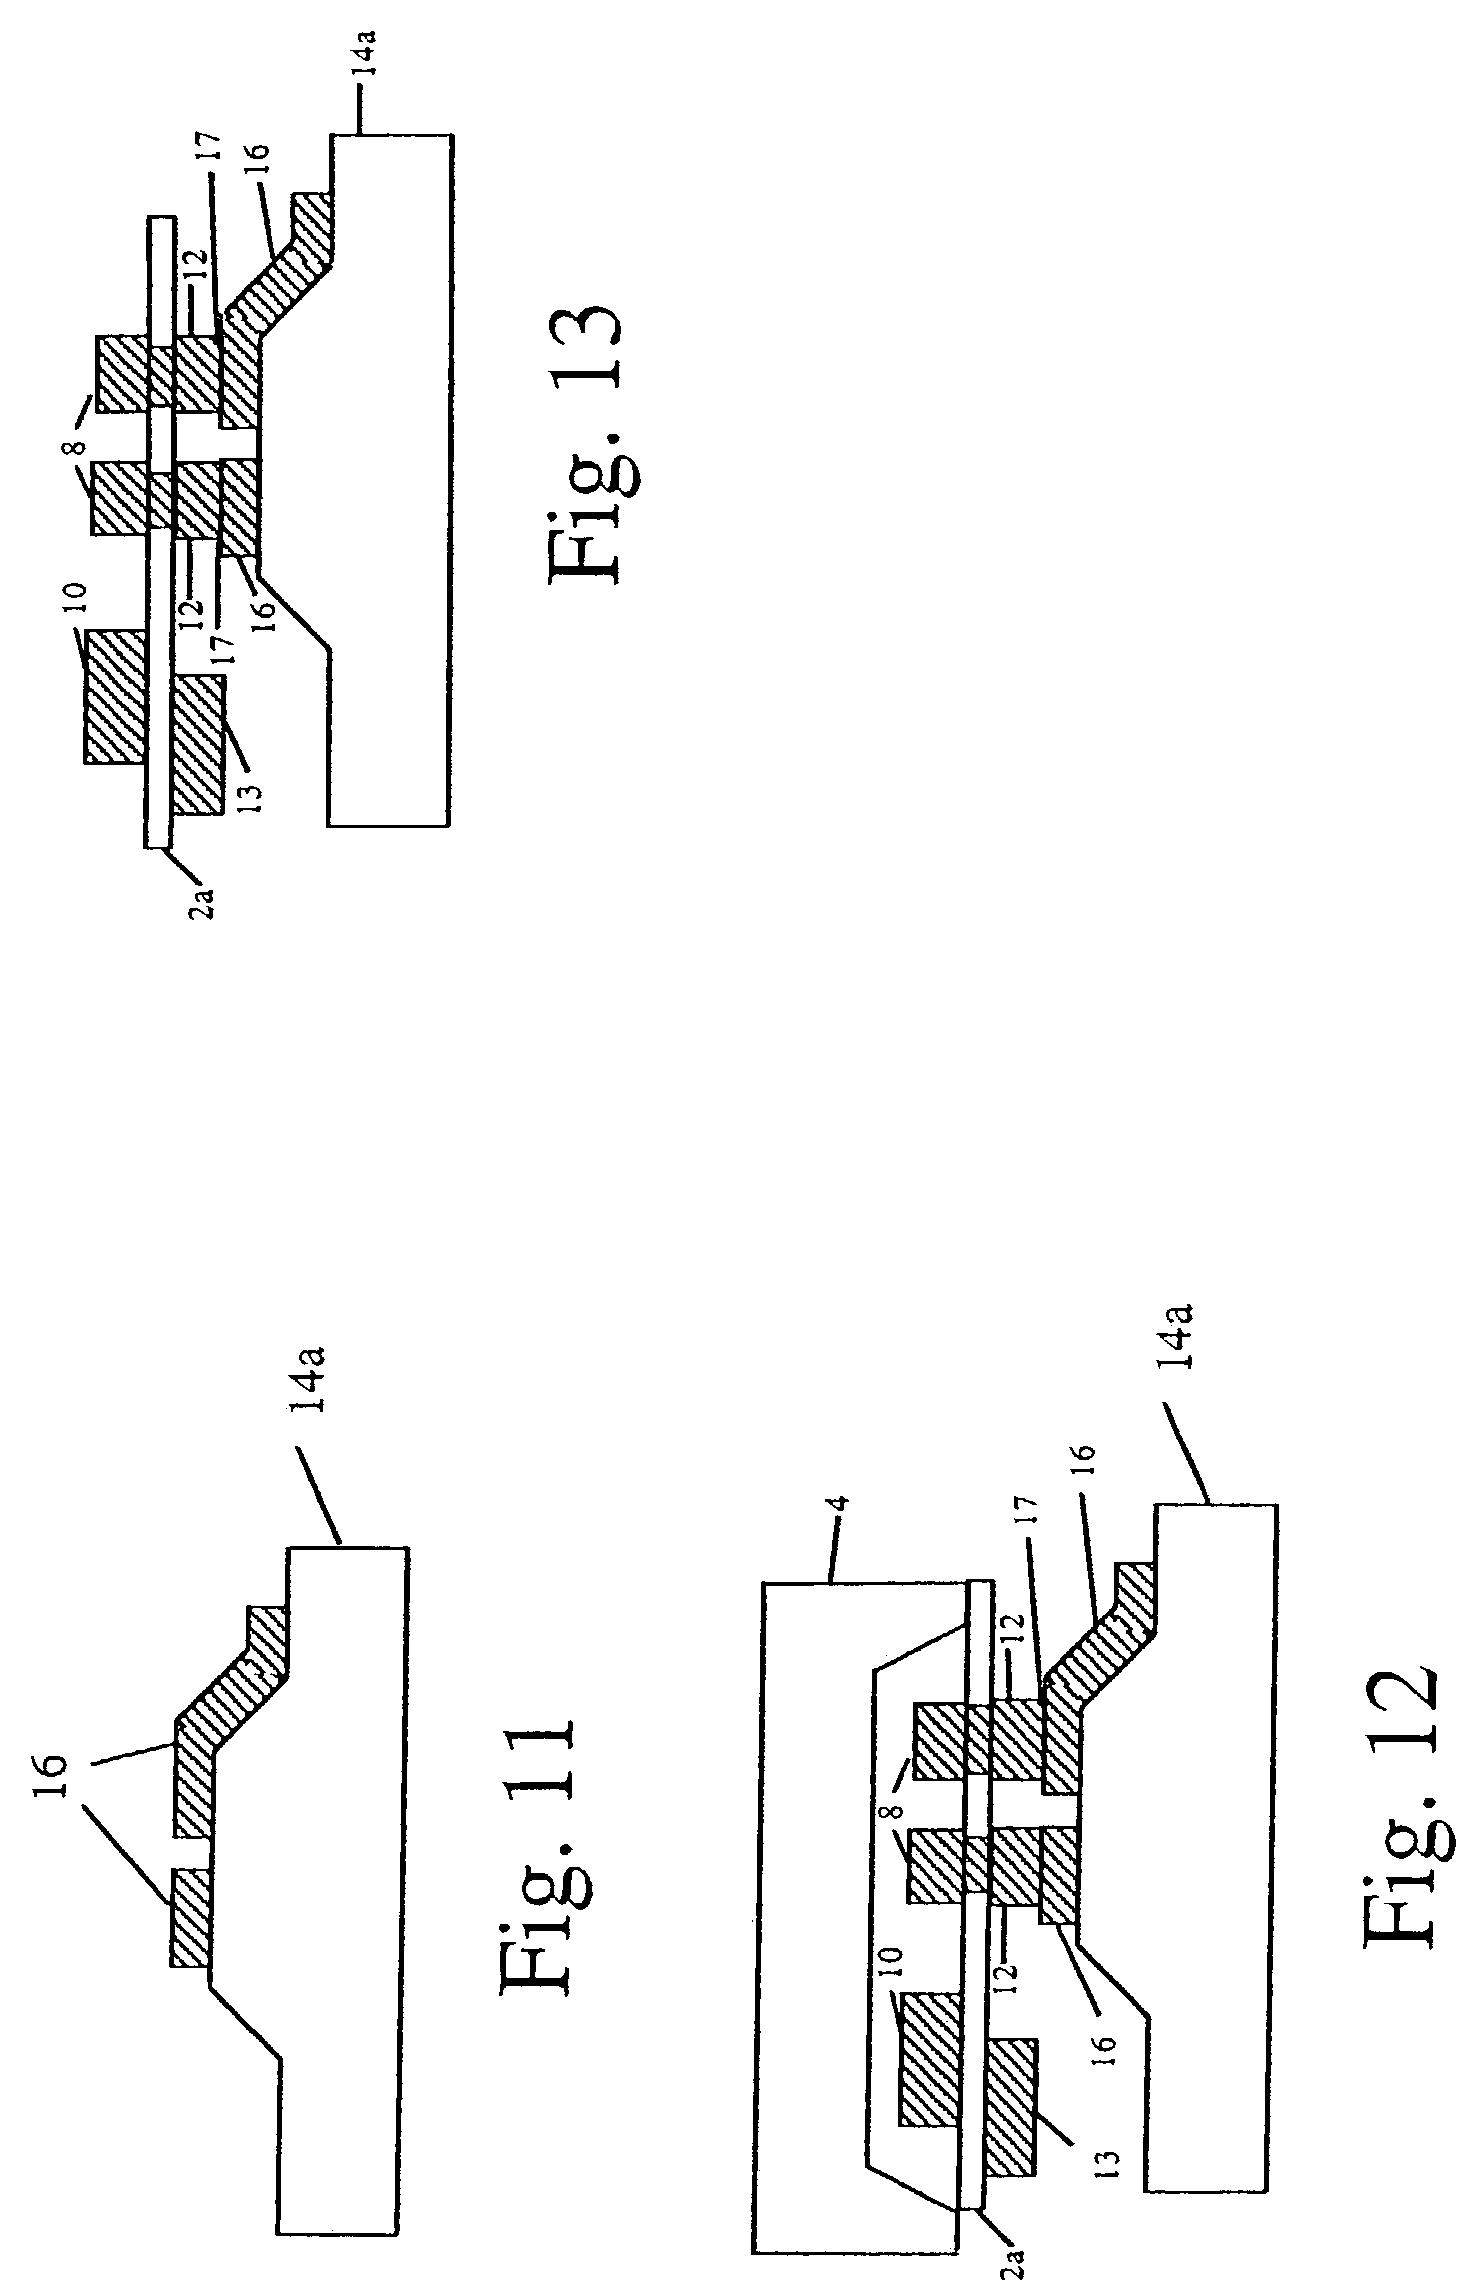 Brevet Us7237315 Method For Fabricating A Resonator Google Brevets 100mhz Quartz Crystal Oscillator Circuit Signalprocessing Patent Drawing